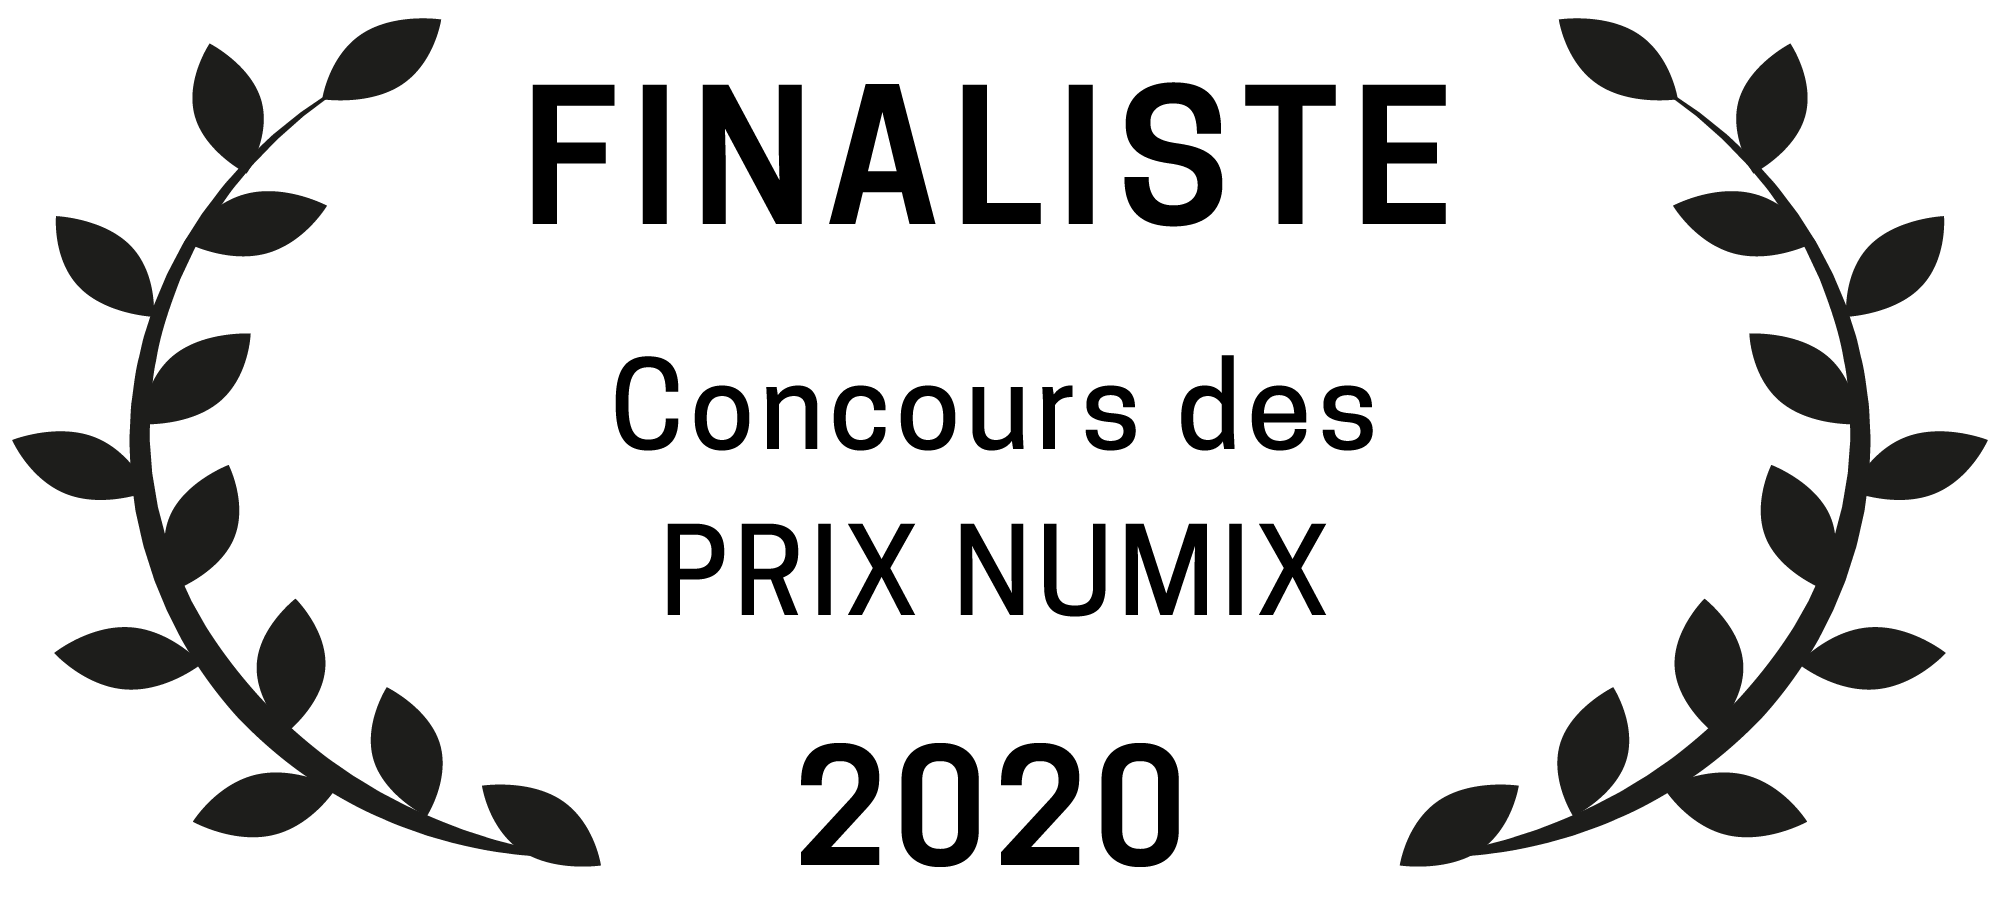 Finaliste Numix 2020